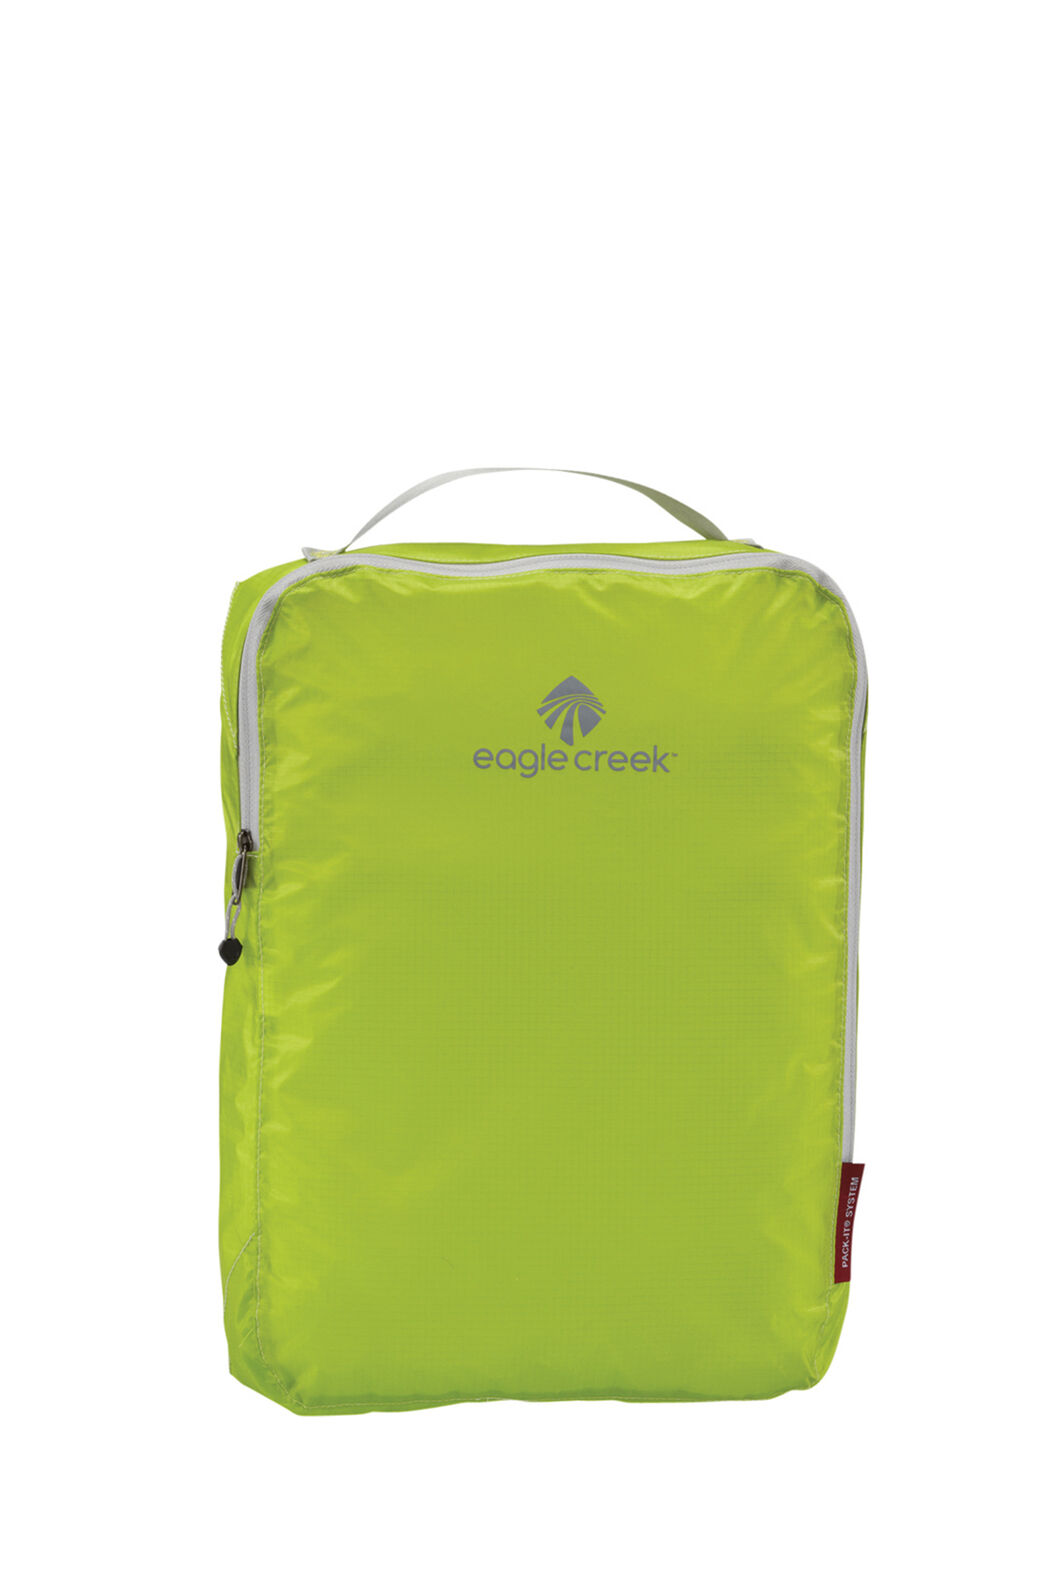 Eagle Creek Pack-It Specter Half Cube Strobe, STROBE GREEN, hi-res